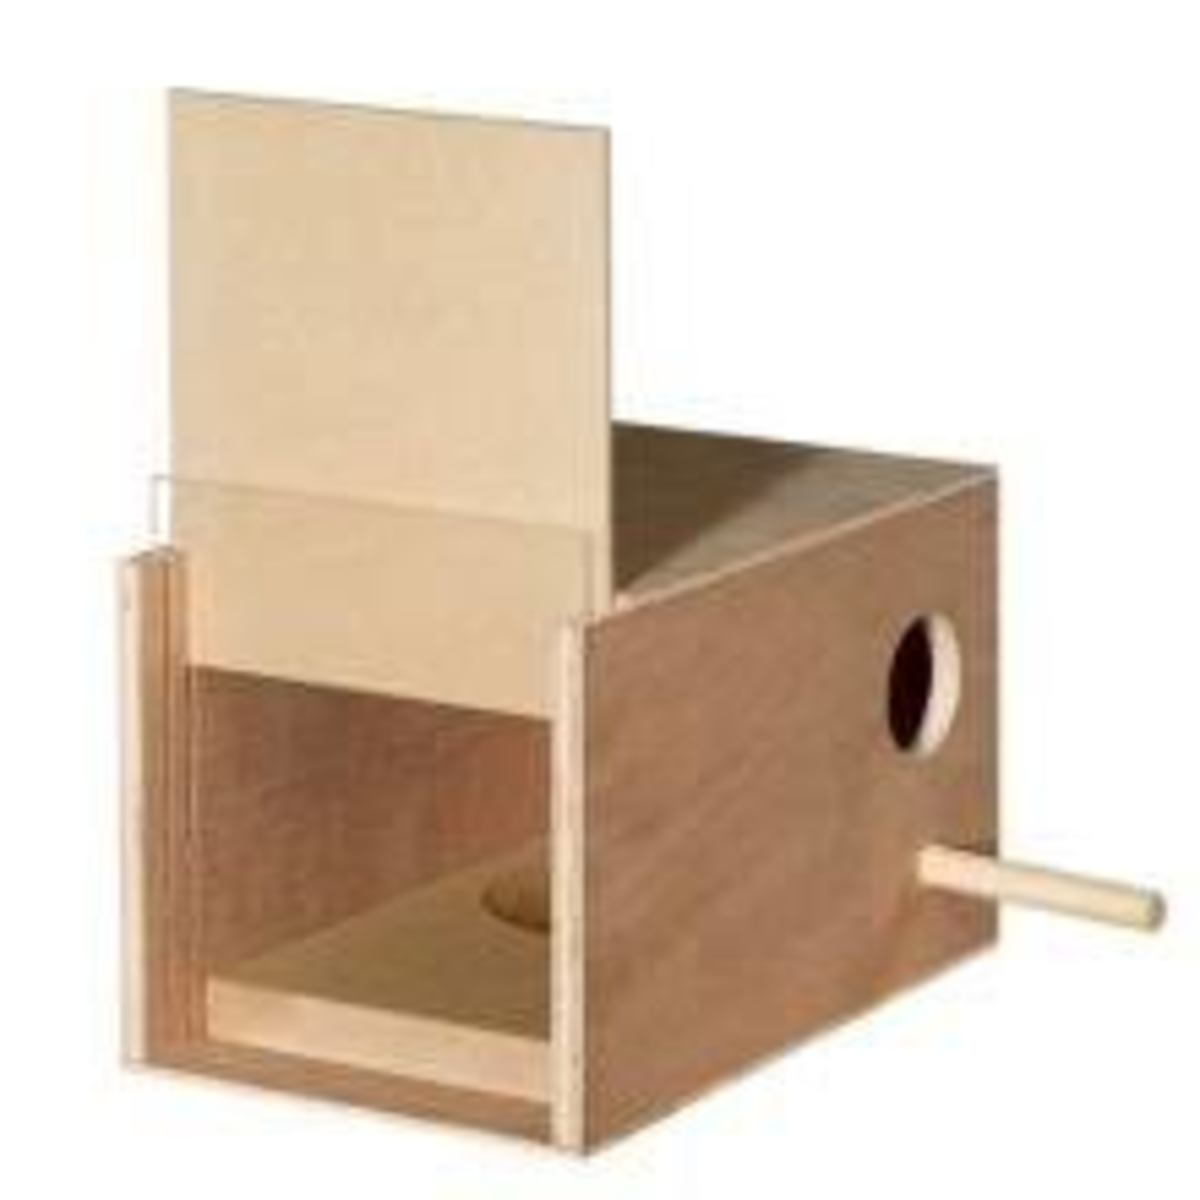 Breeding box.